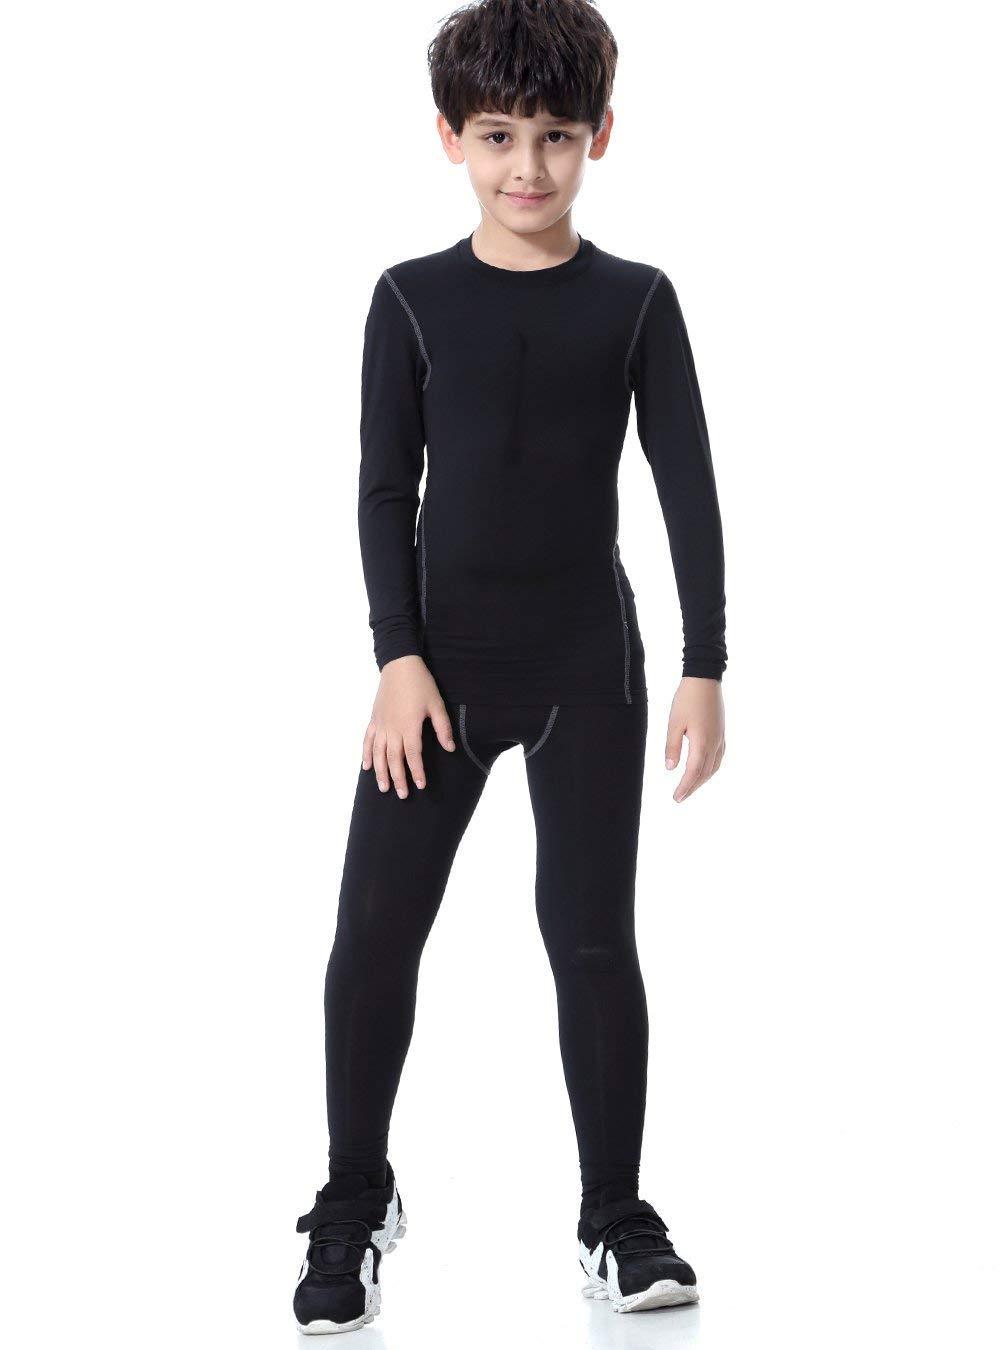 LNJLVI Kids Boys Compression Long Sleeve Quick Dry Pant Sports Base Layers 2 Set